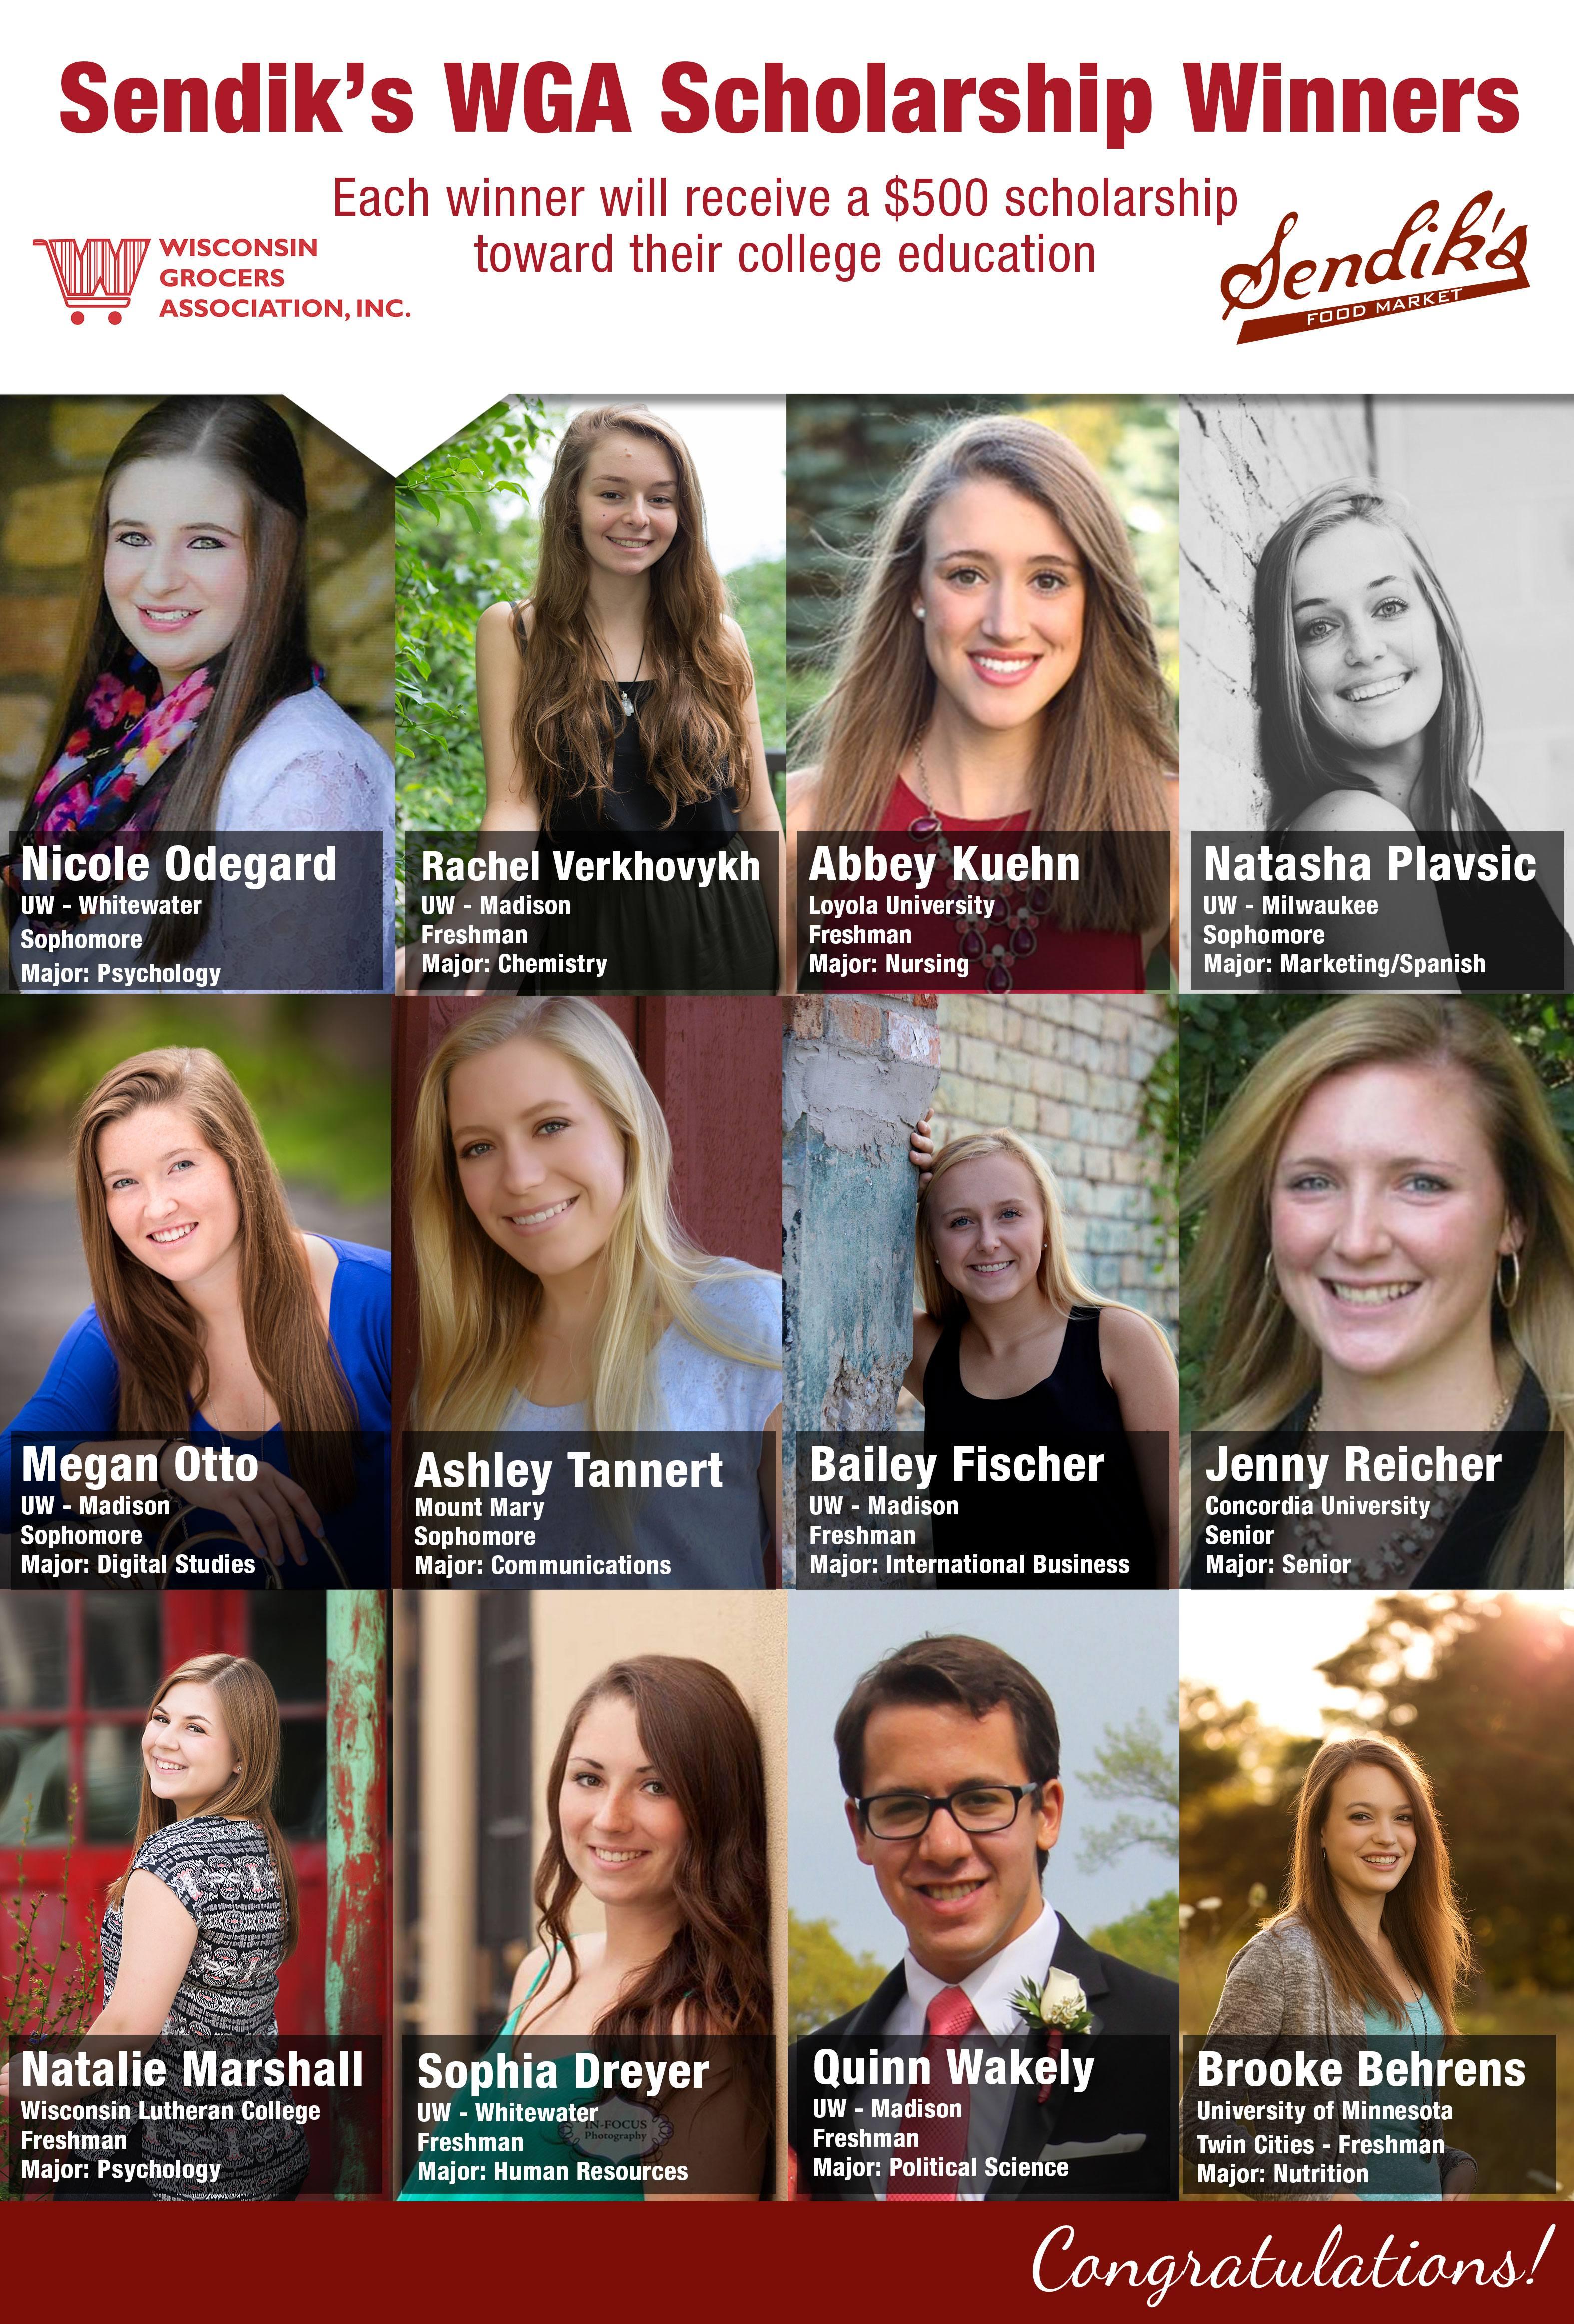 2016 WGA Scholarship Winners